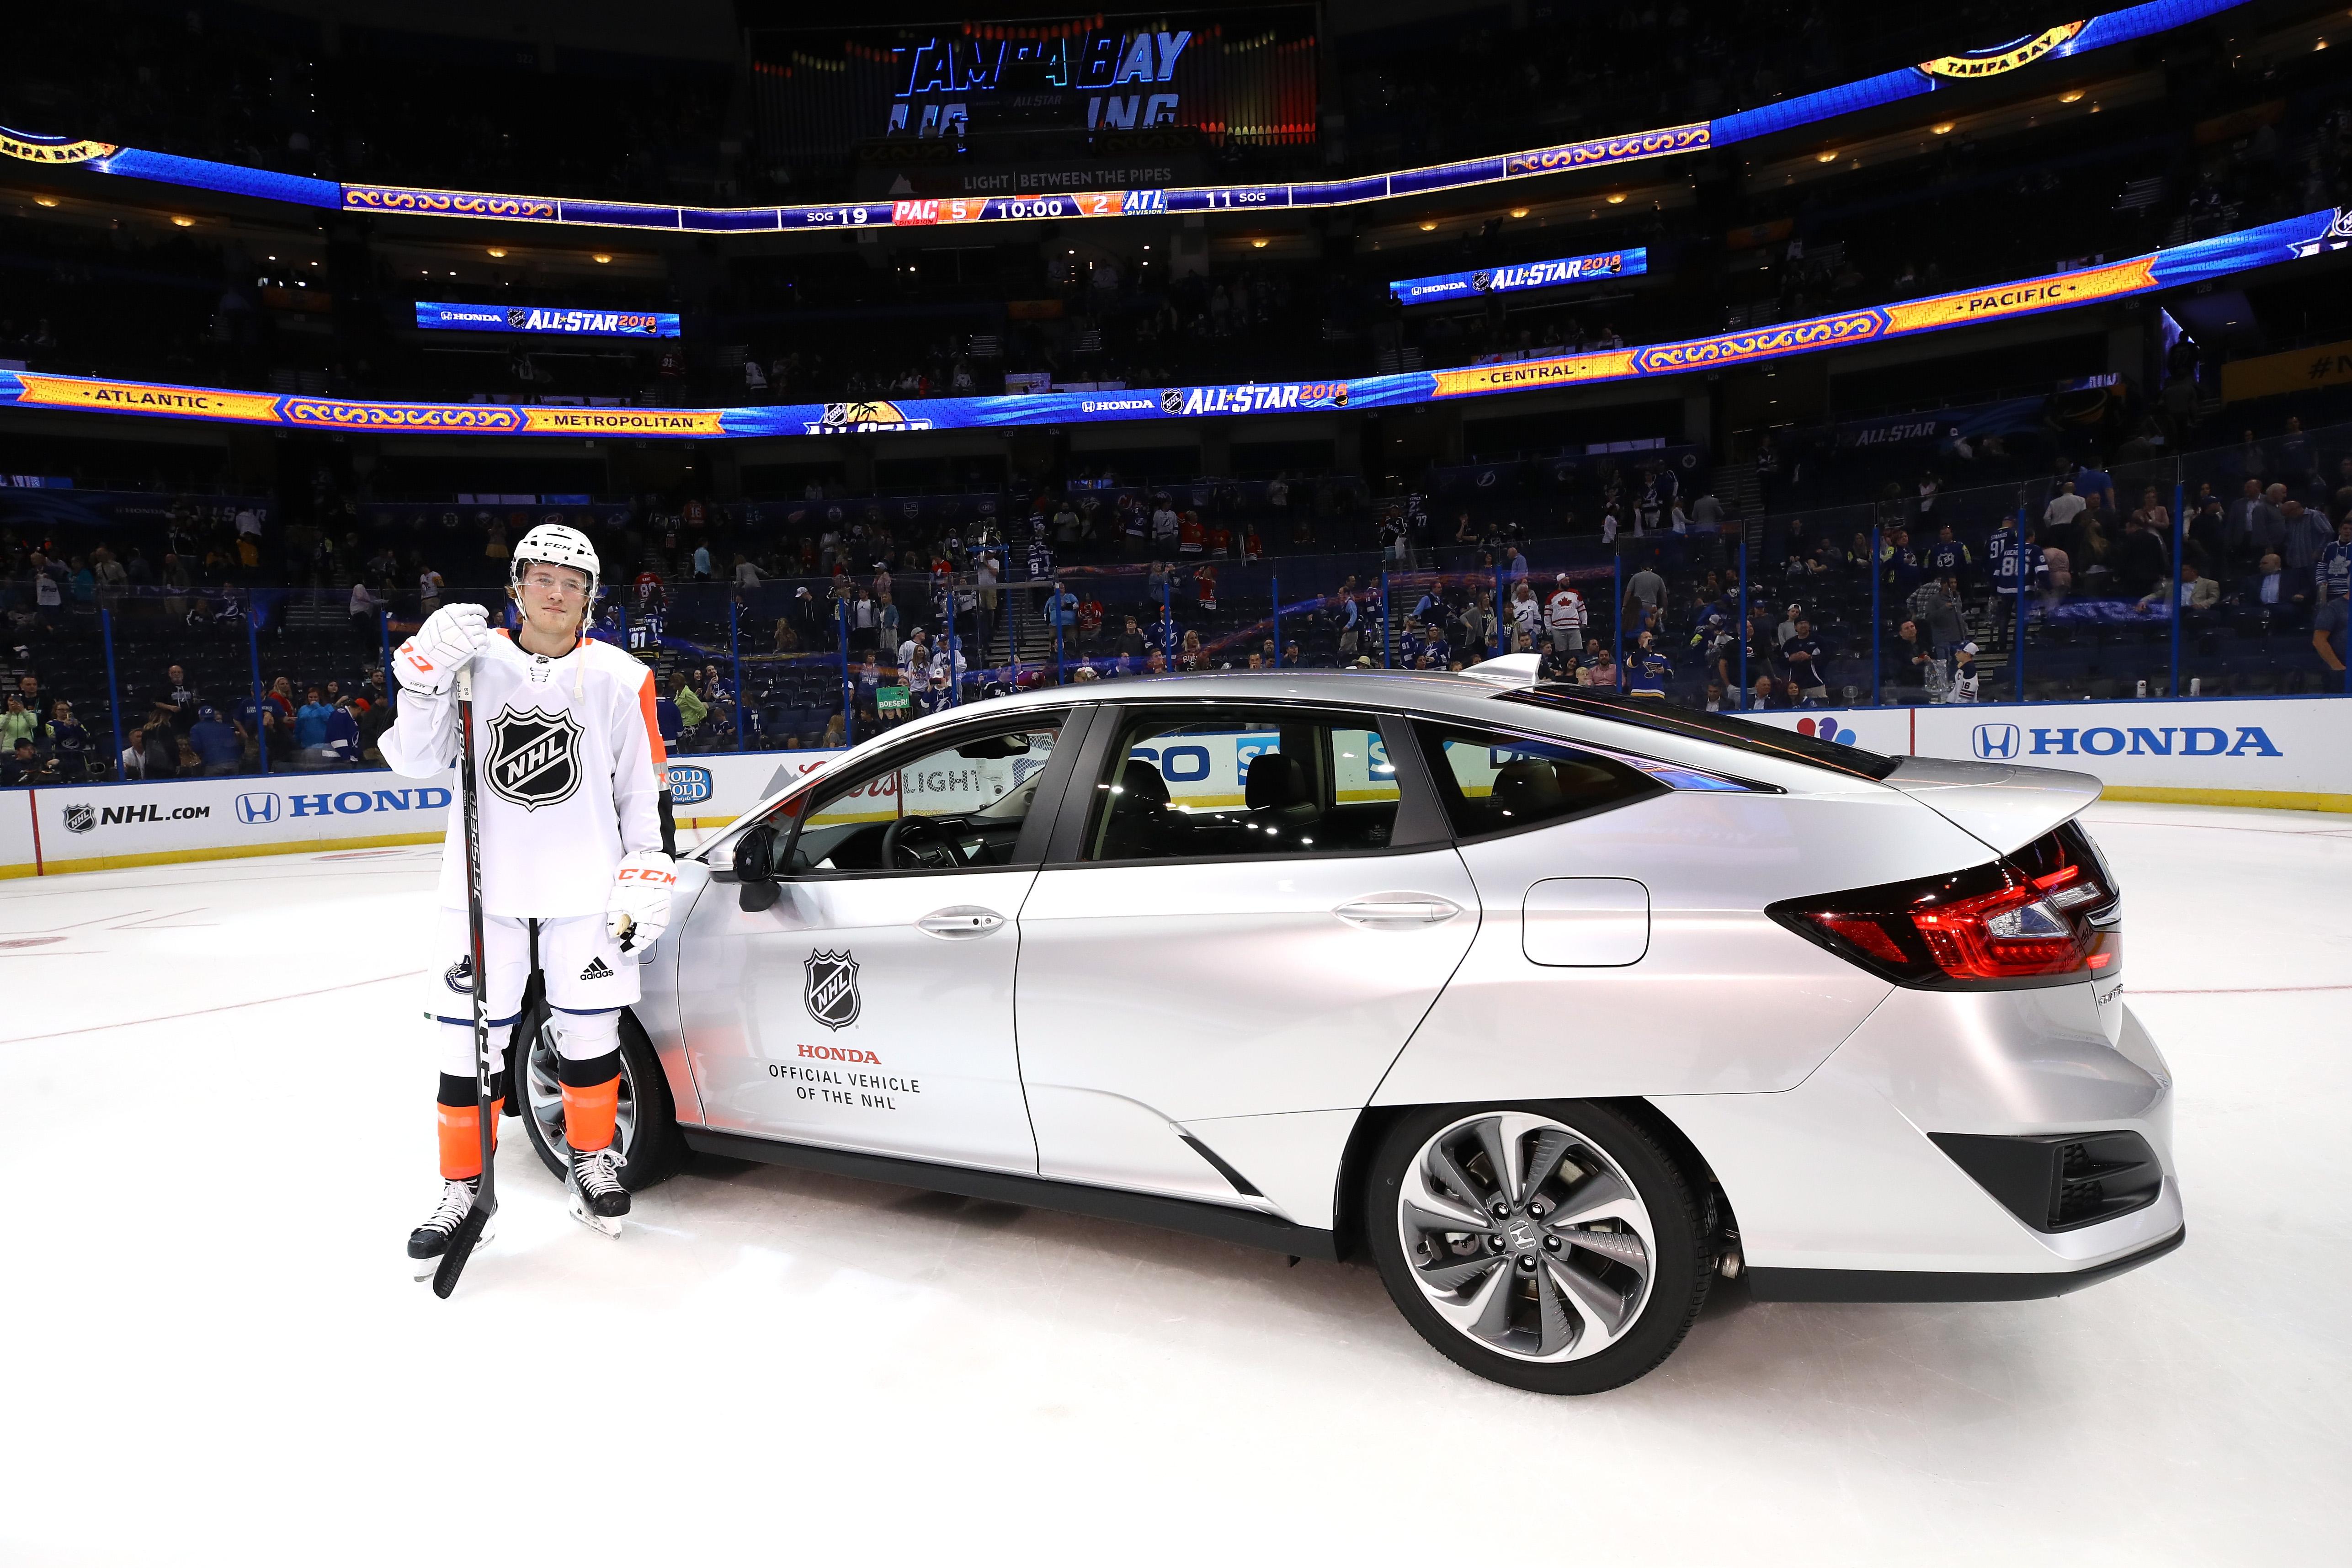 2018 Honda NHL All-Star Game - Atlantic v Pacific